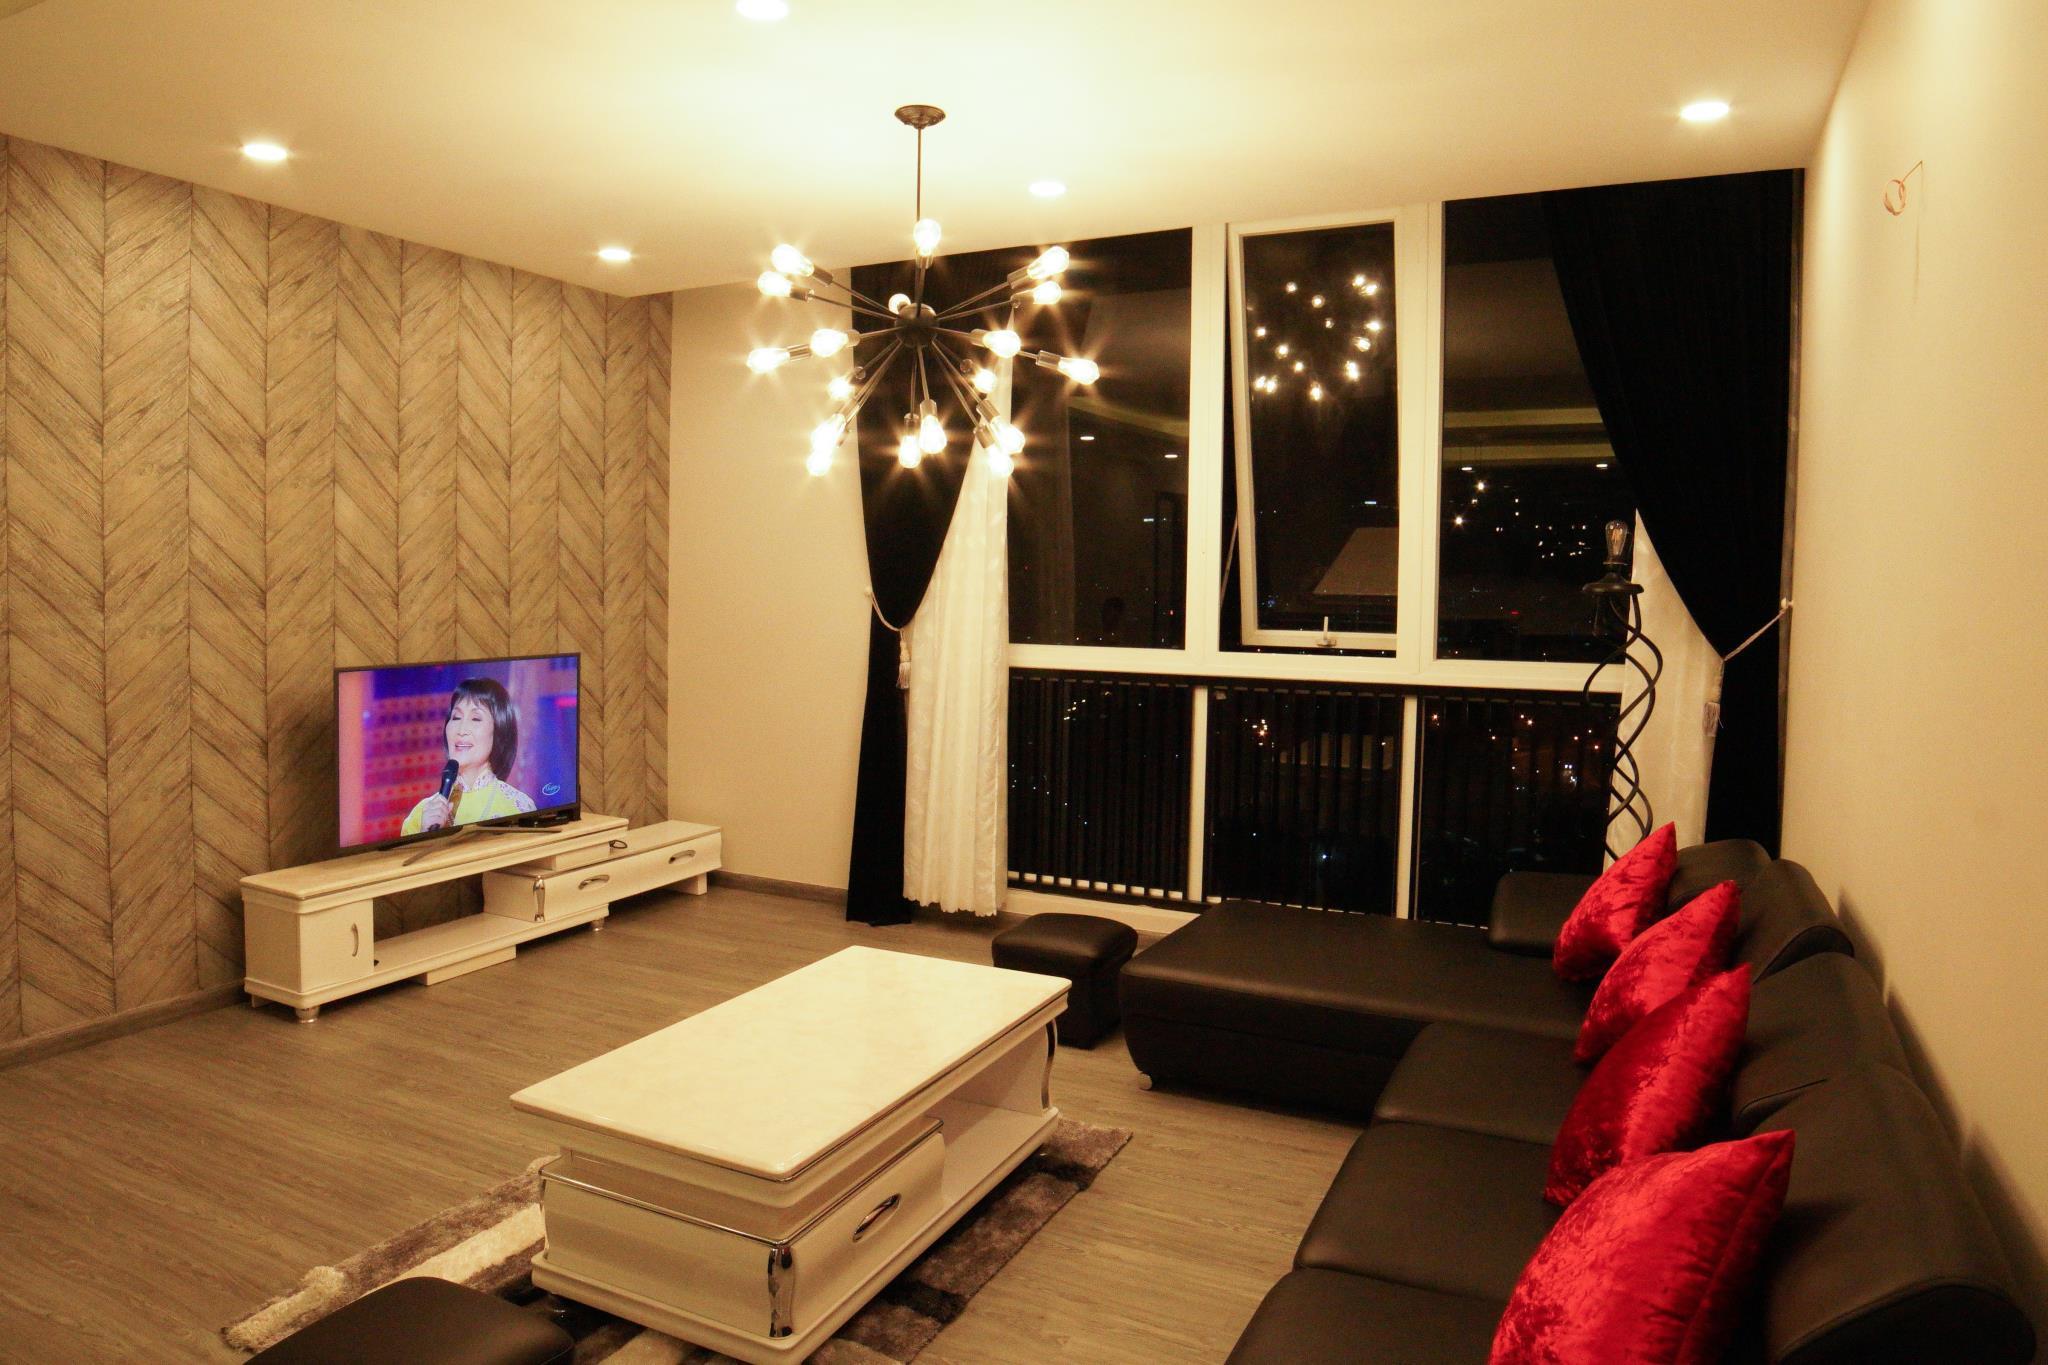 Son Thinh 2 Apartment